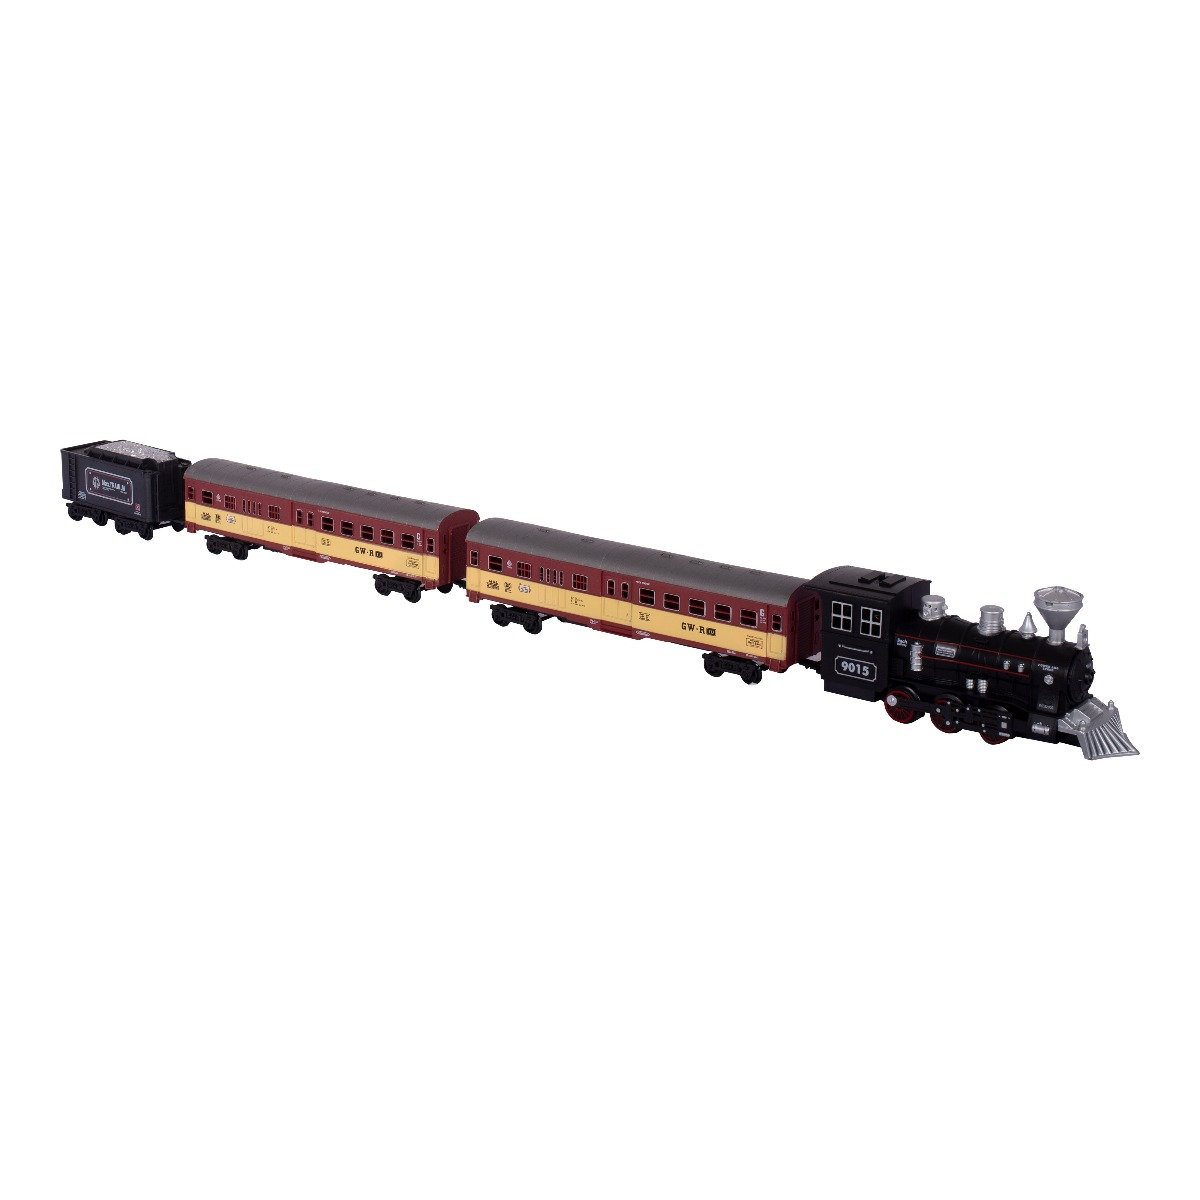 Trenulet cu lumini, sunete si abur Cool Machines Noriel